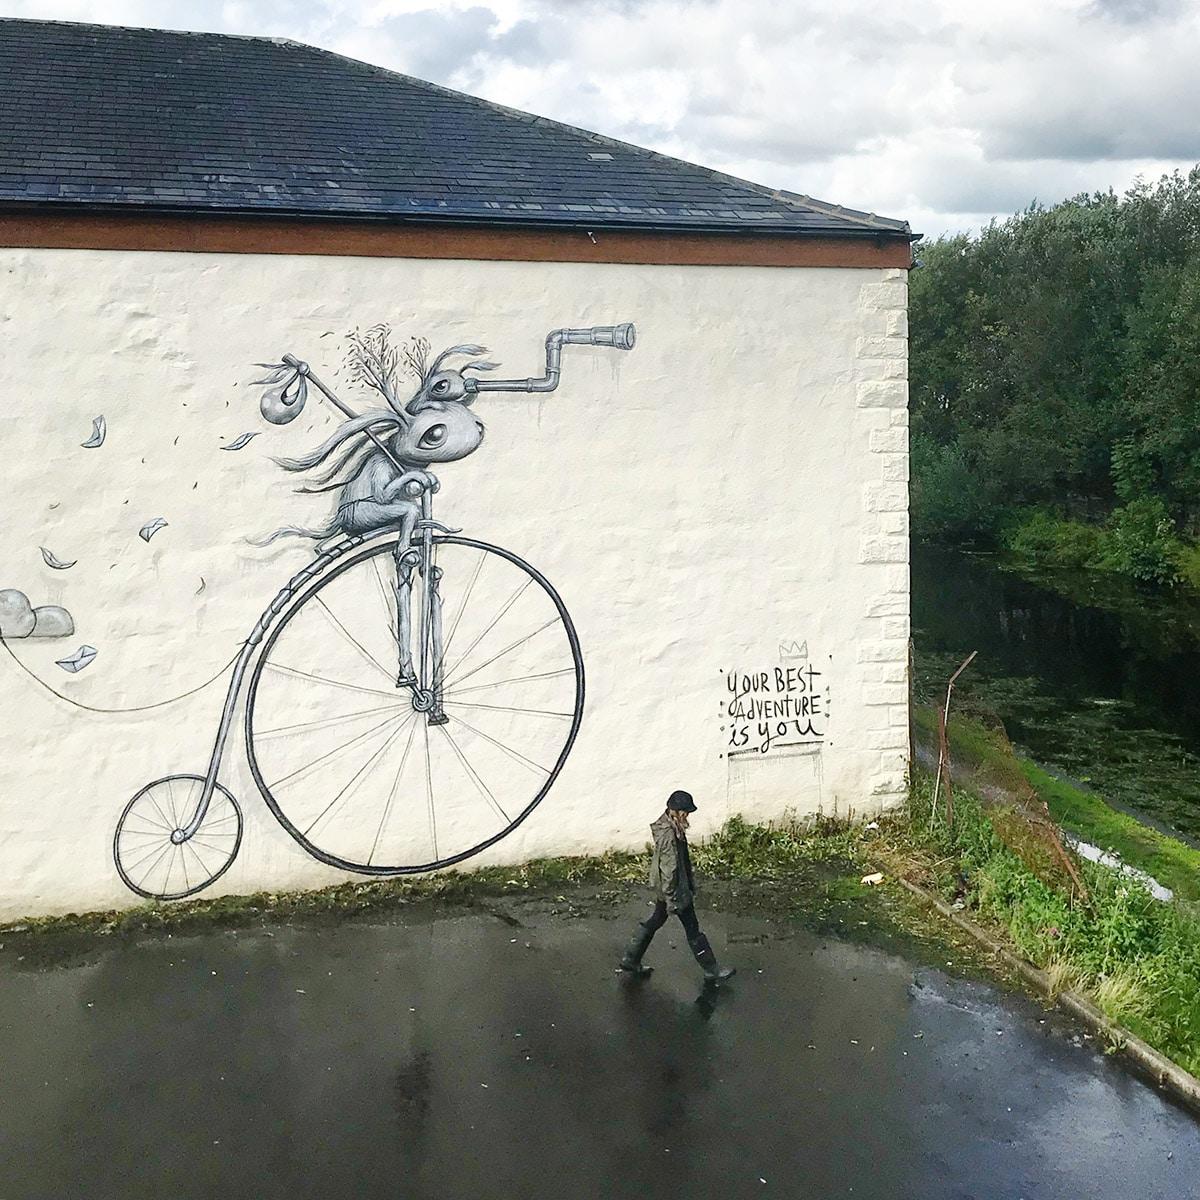 Surreal Street Art by Hayley Welsh